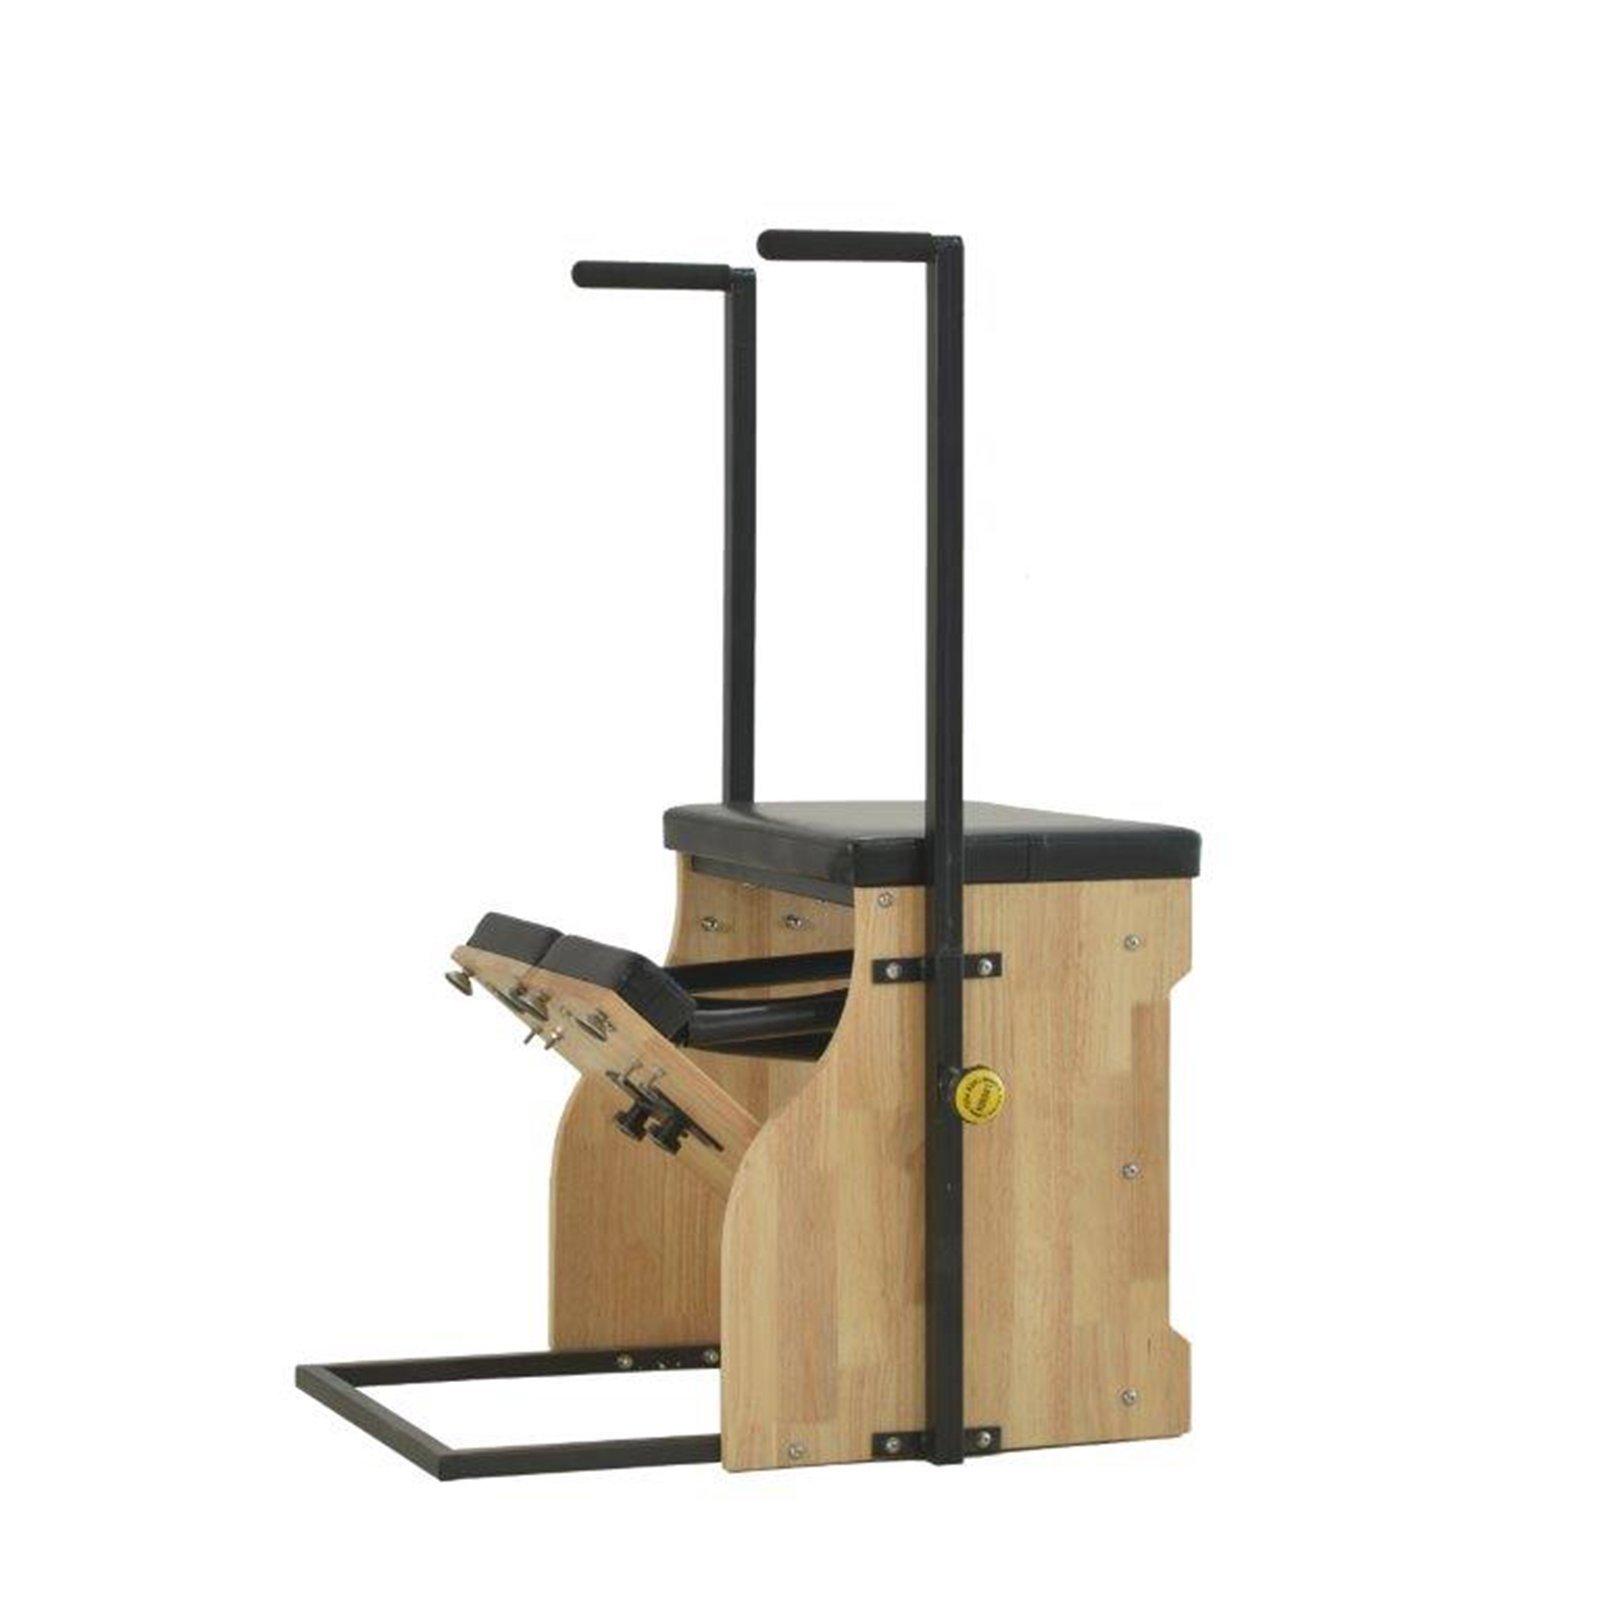 Pilates Wunda Chair with Handles